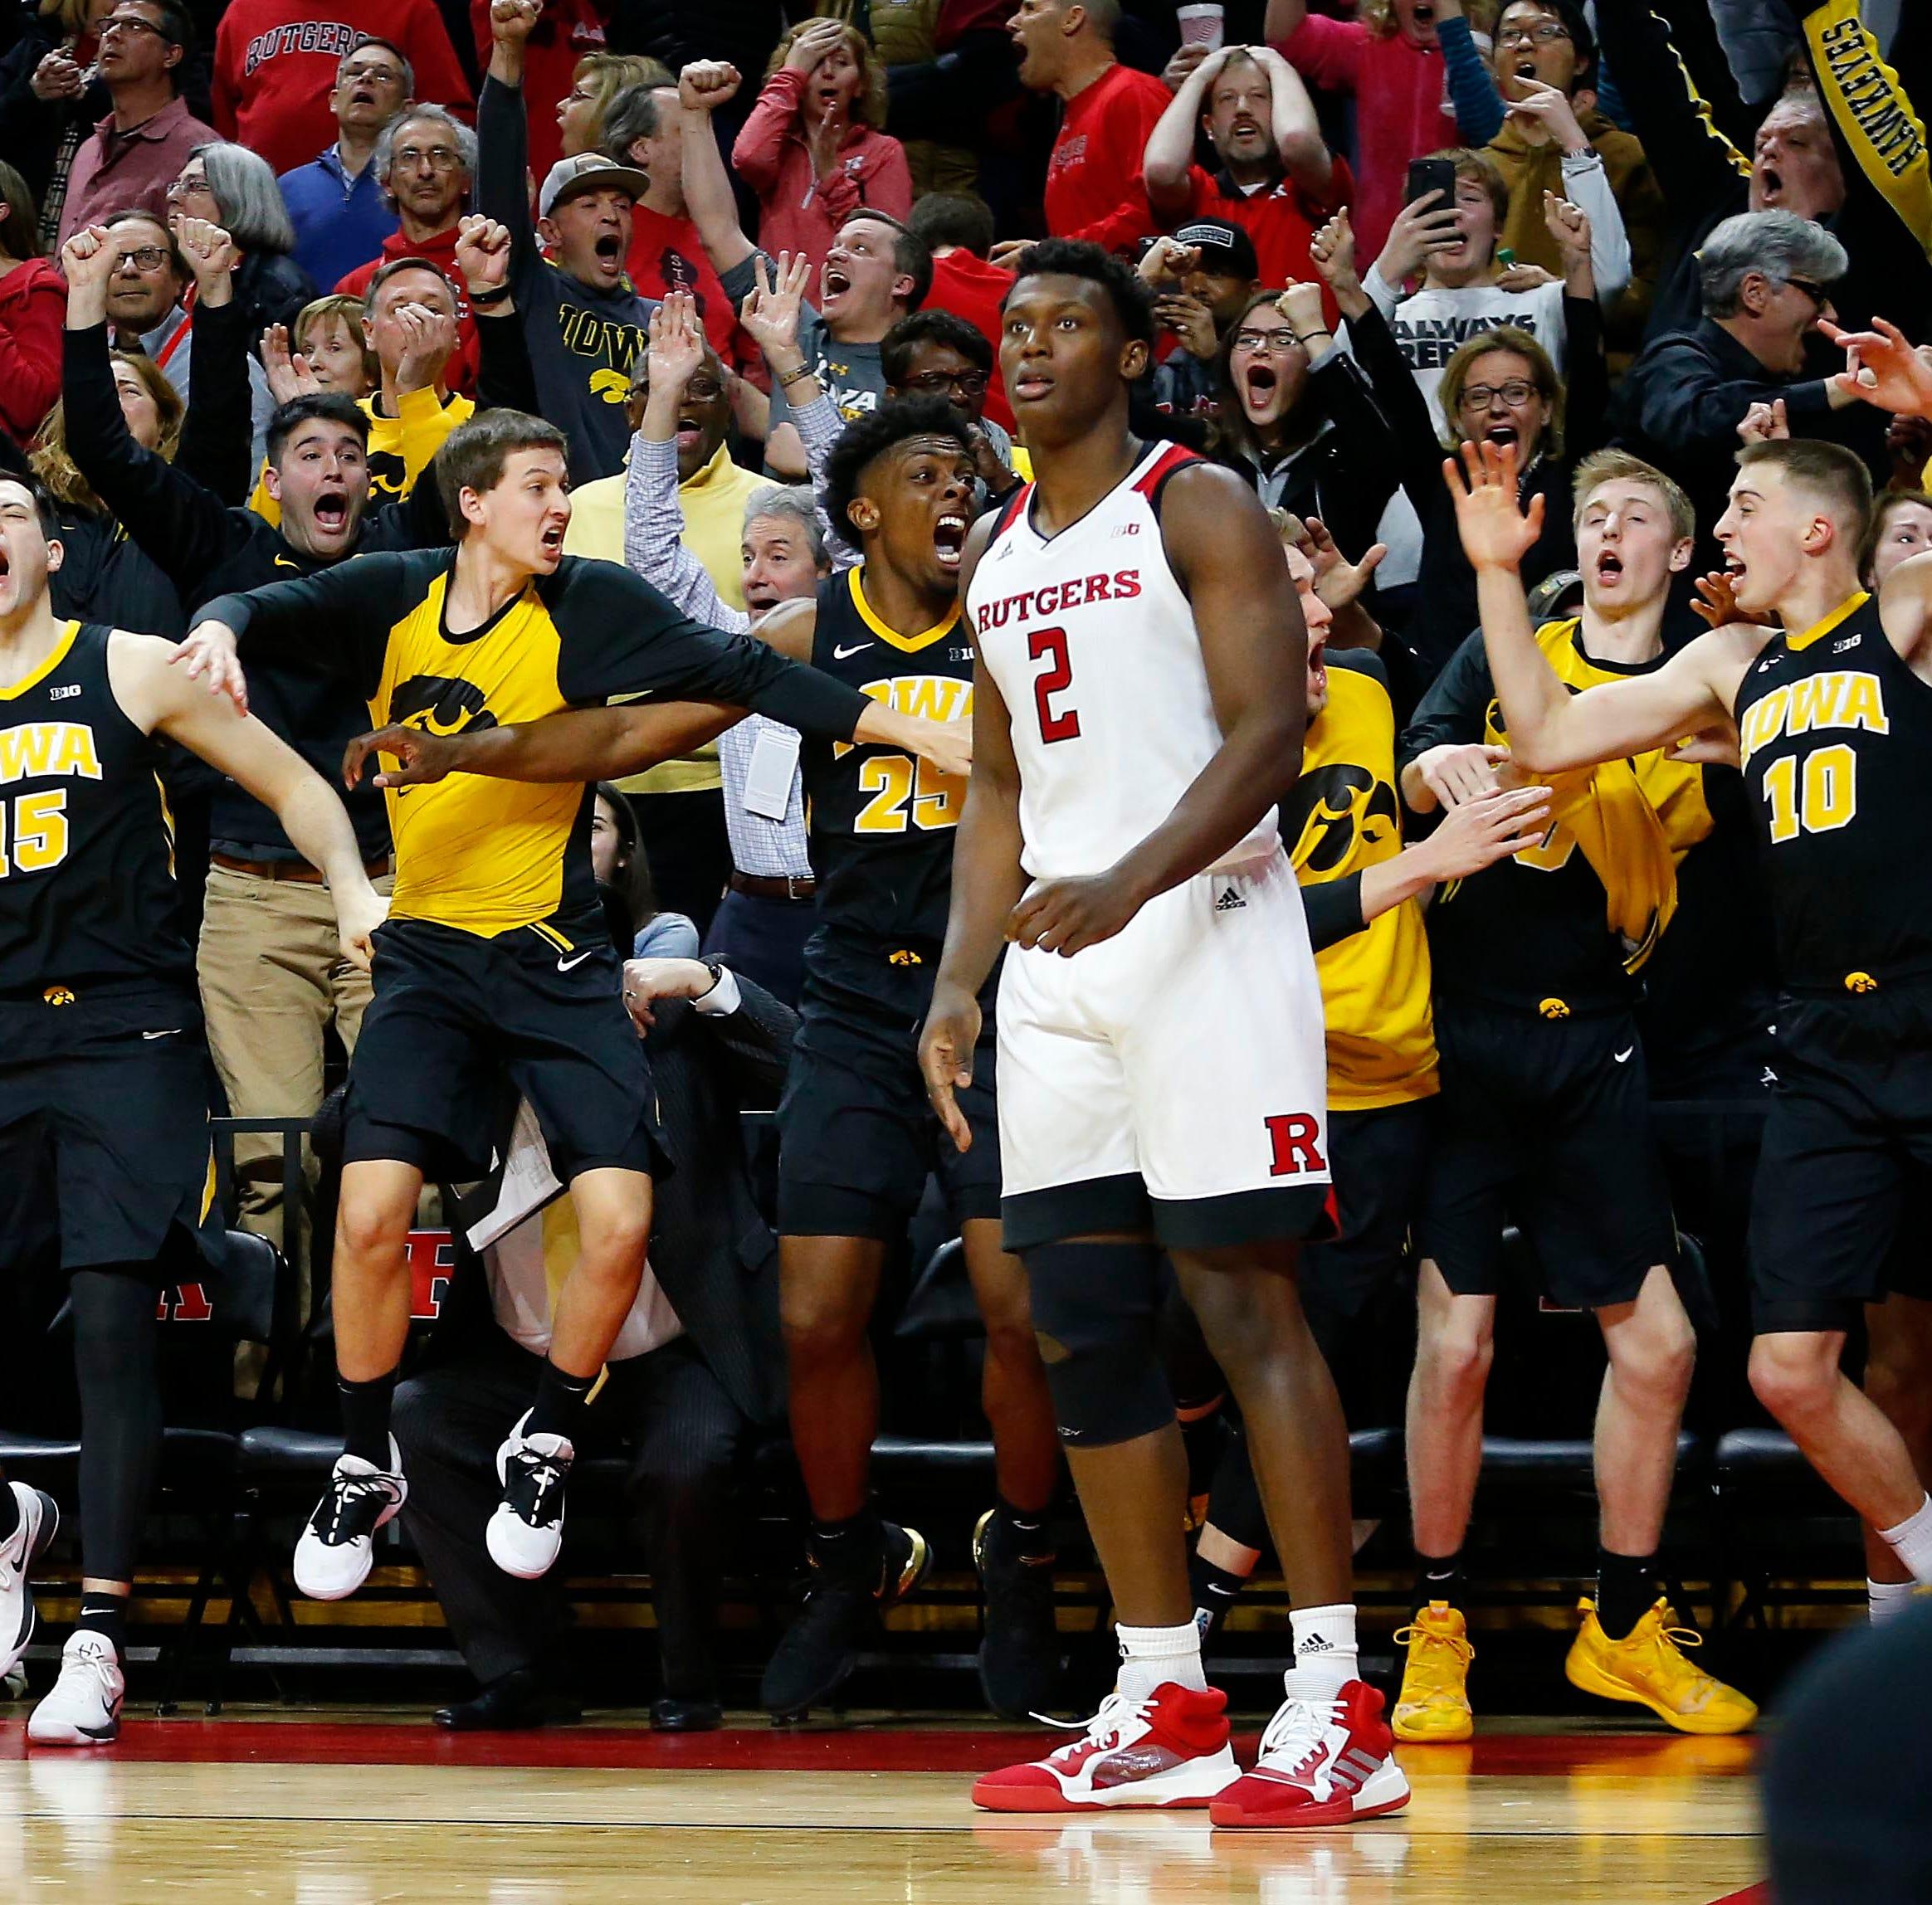 Rutgers hoops: Joe Wieskamp and the anatomy of Iowa's last-second RAC gut-punch